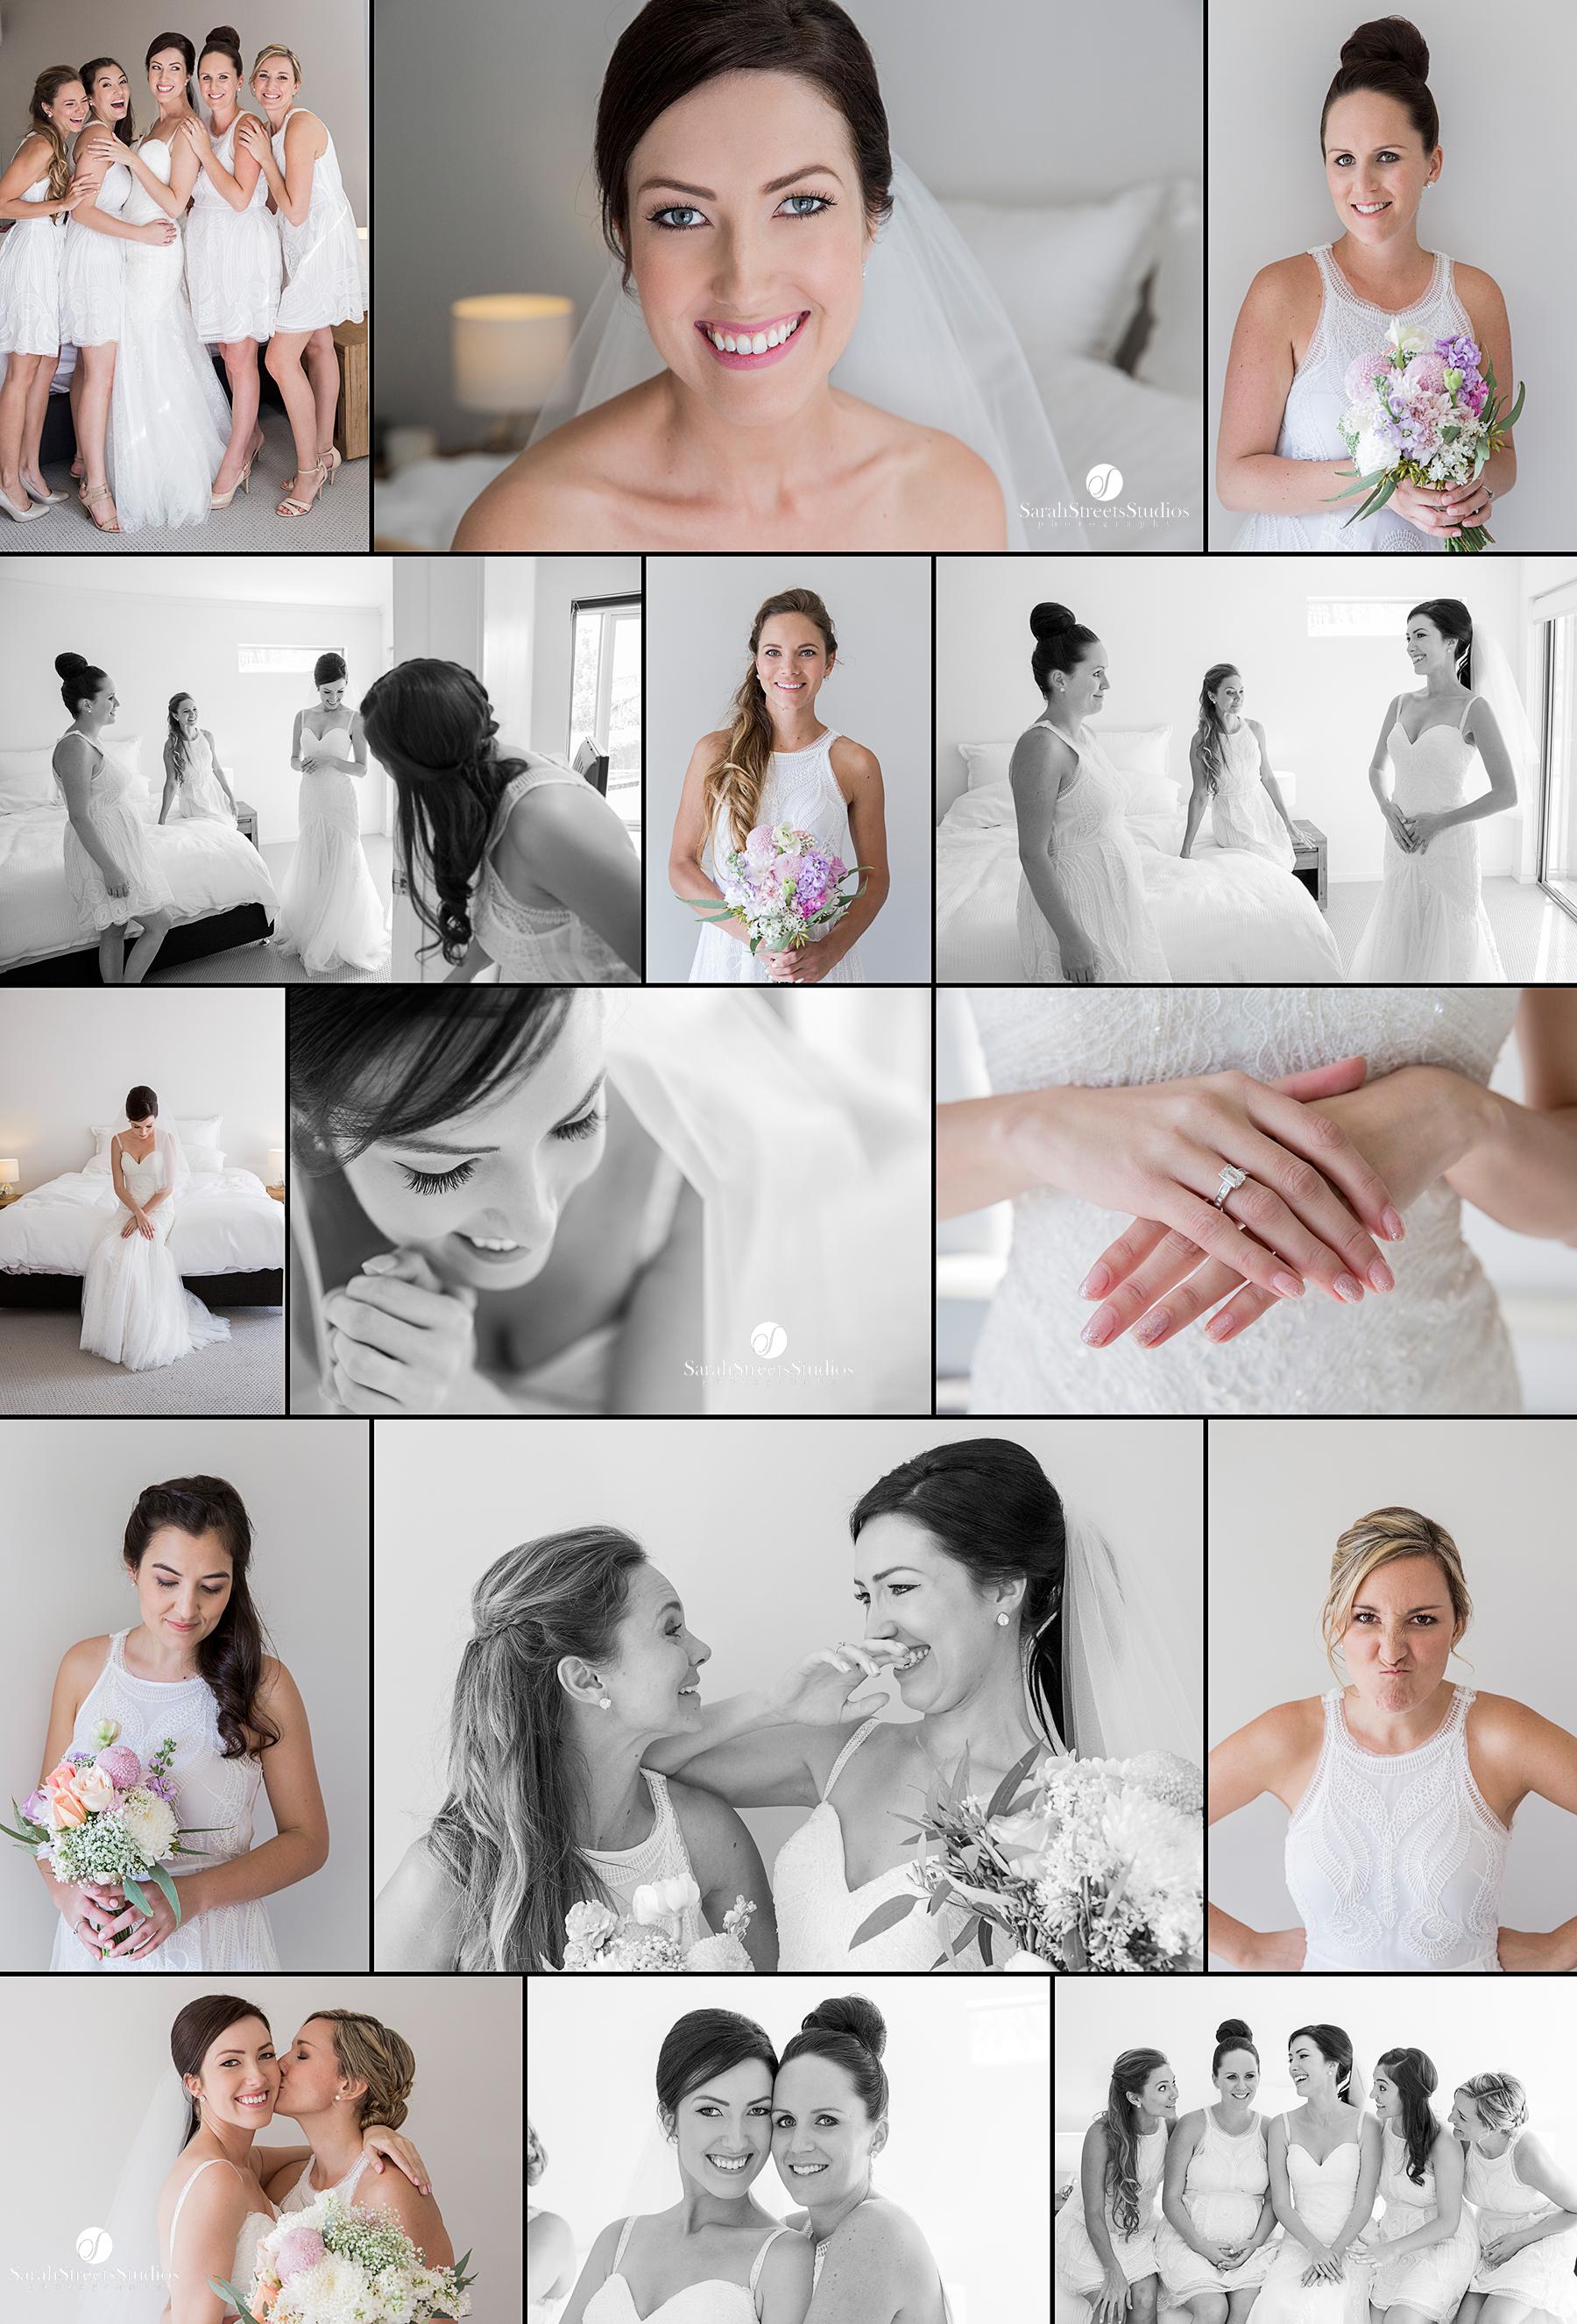 candid wedding photography brisbane, best wedding photographers brisbane, wedding photography brisbane, sarah streets studios